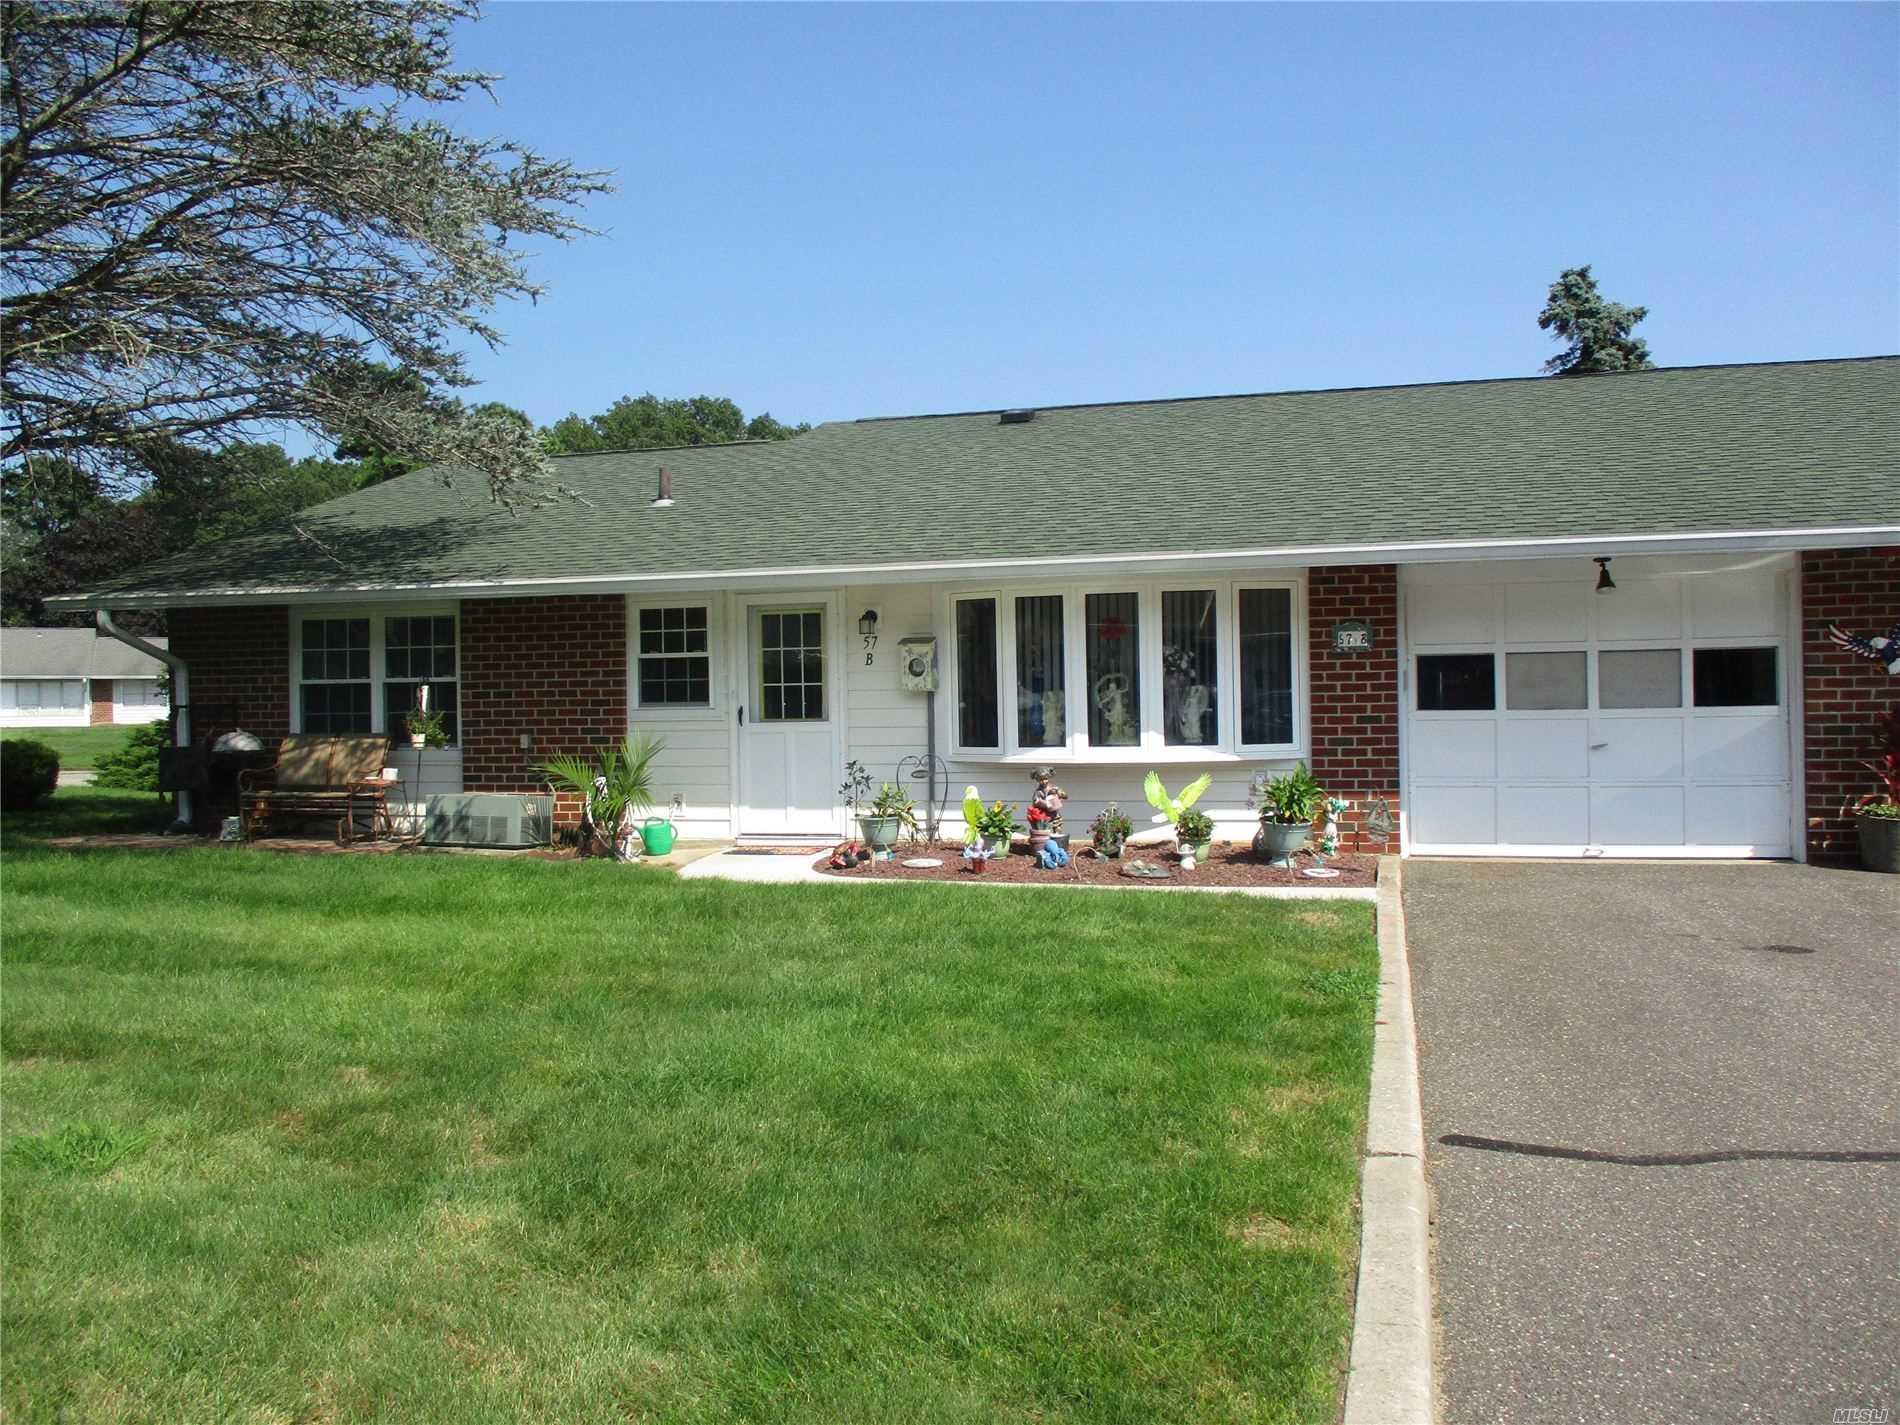 Property for sale at 57B Aylesbury Court, Ridge NY 11961, Ridge,  New York 11961